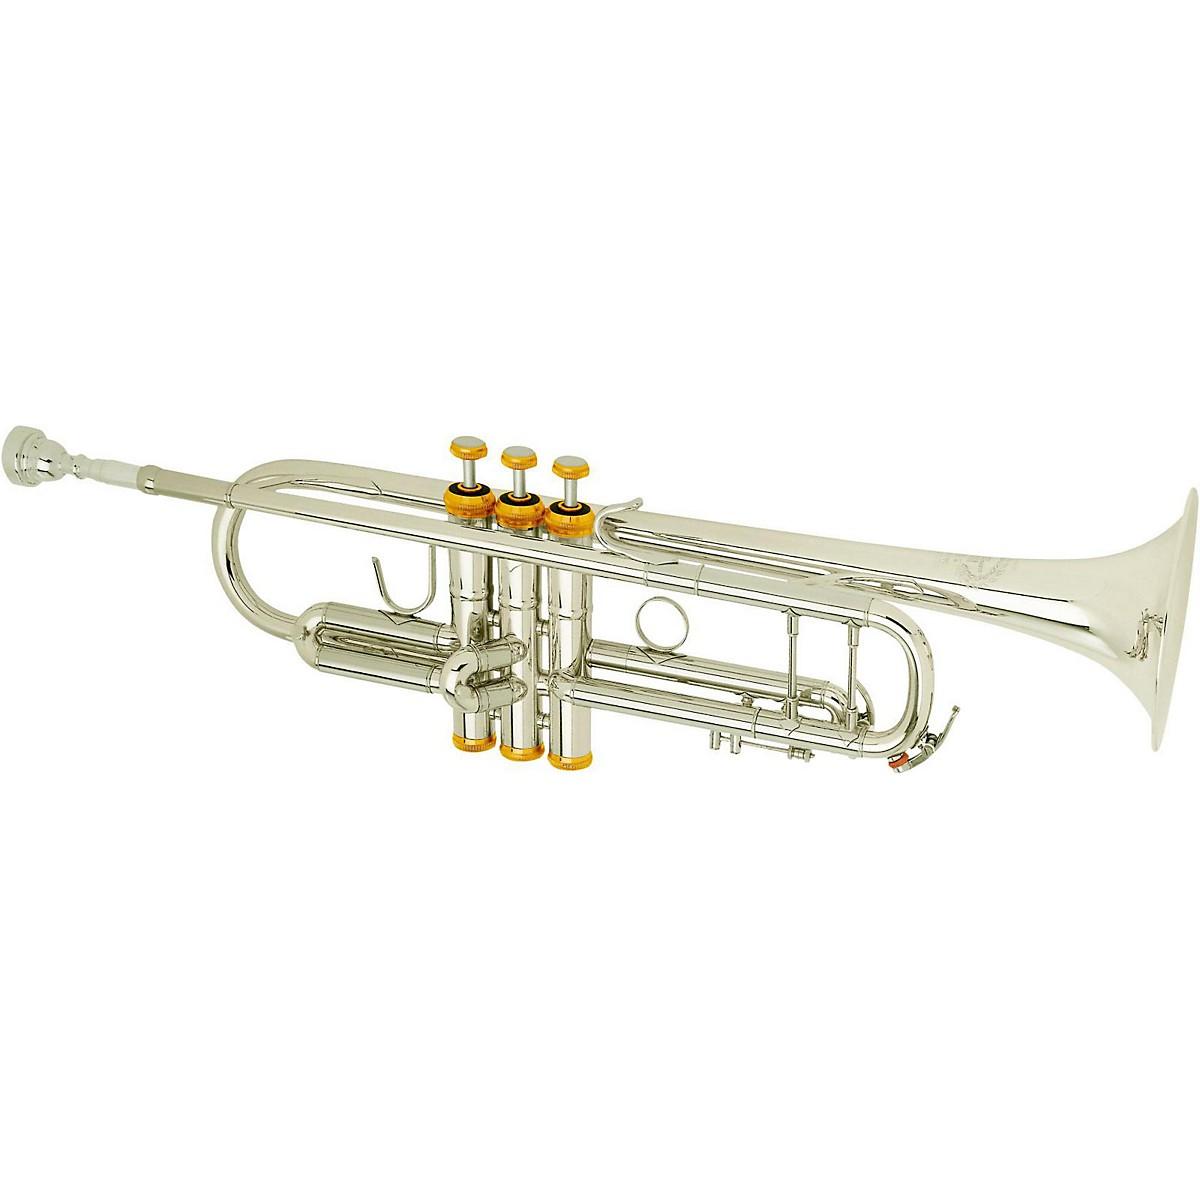 B&S 3137-SG Challenger I Series Bb Trumpet